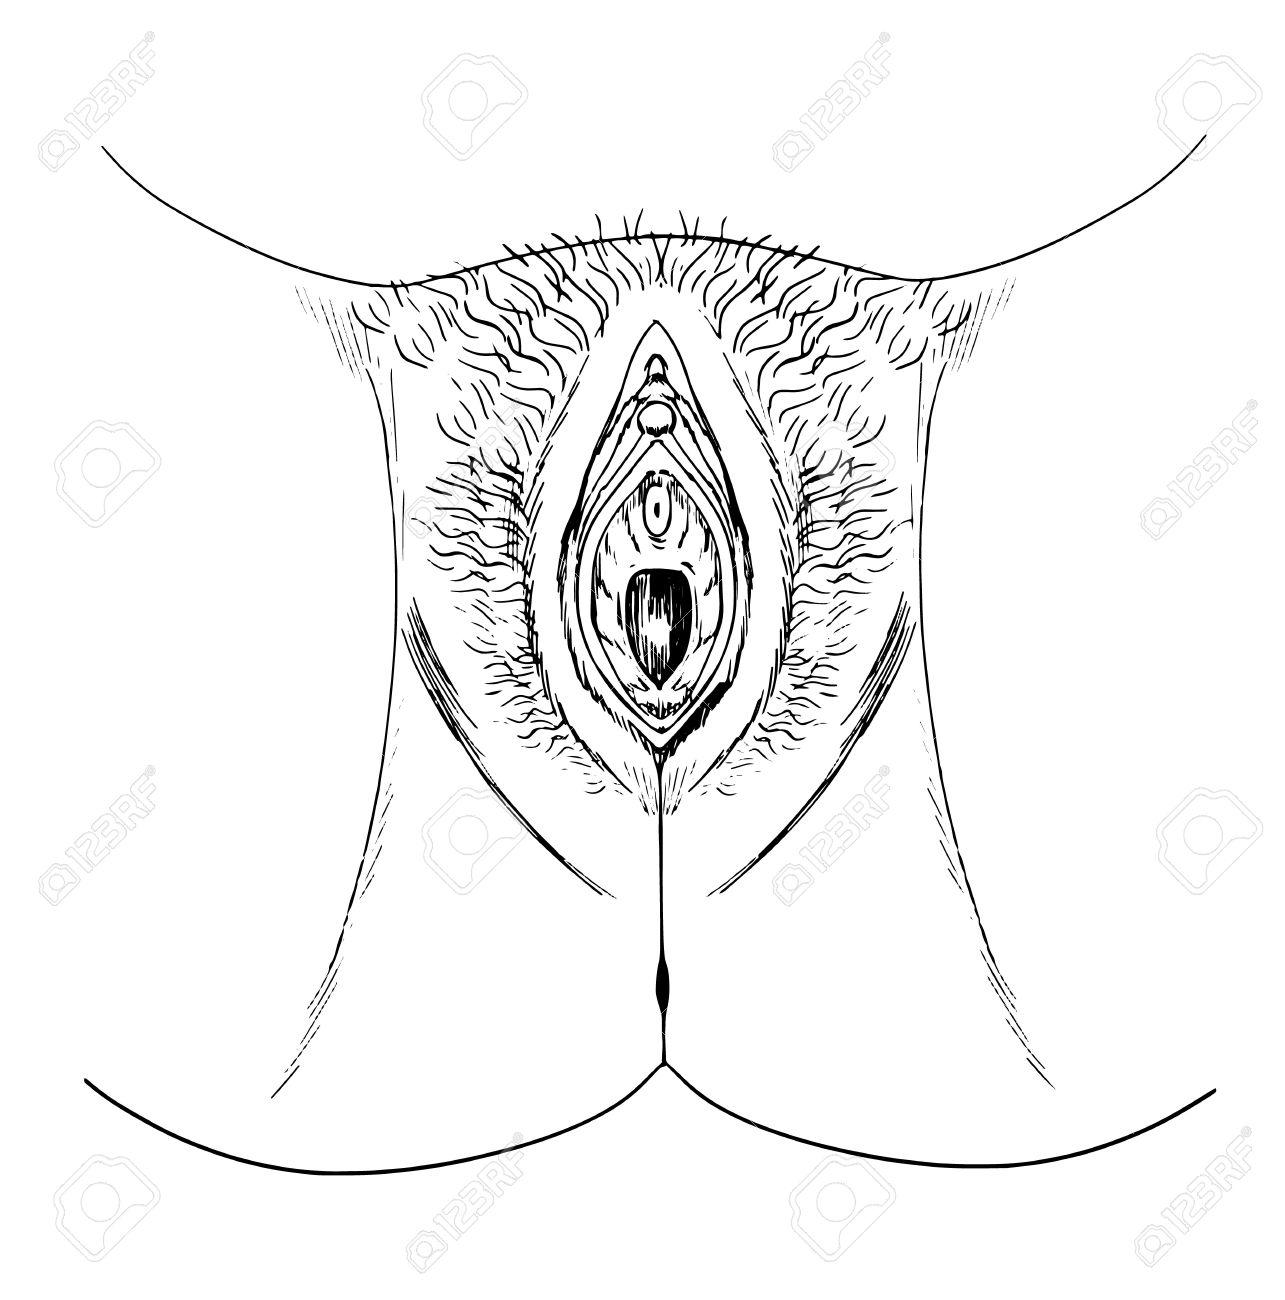 seksi-telki-golie-foto-krupnom-plane